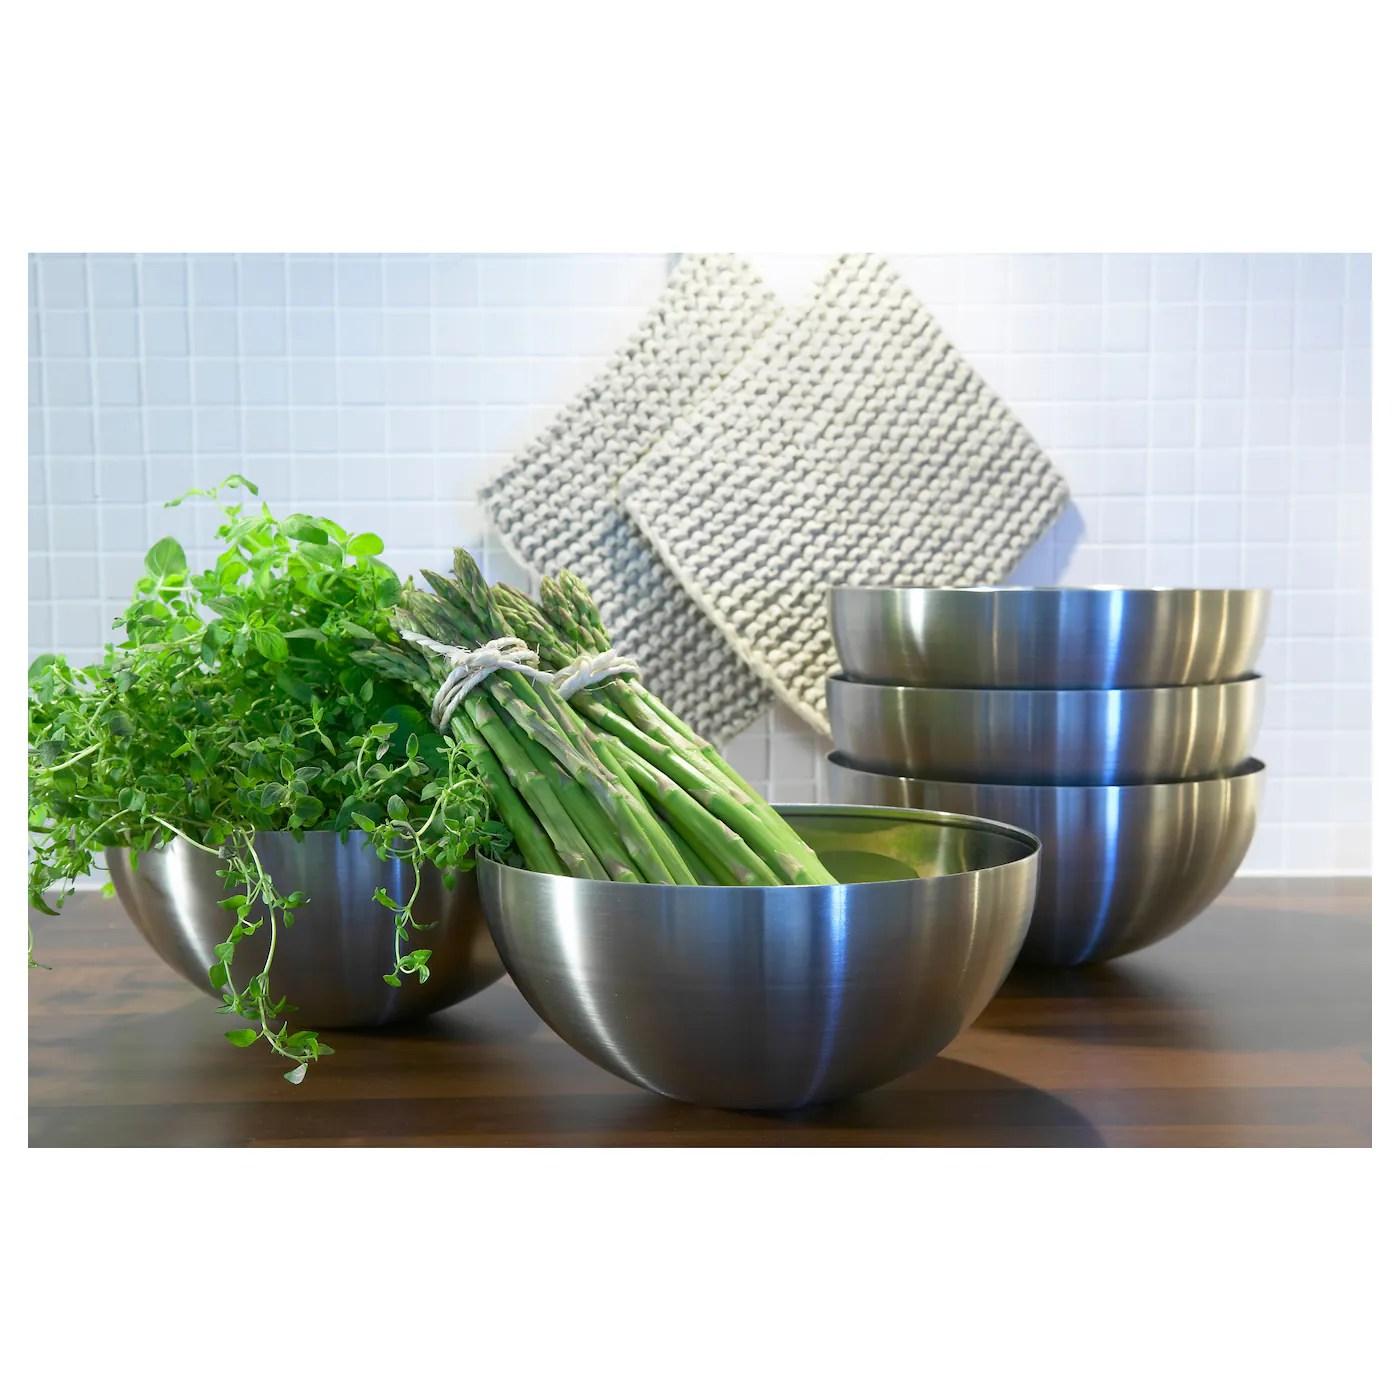 blanda blank saladier acier inoxydable 12 cm